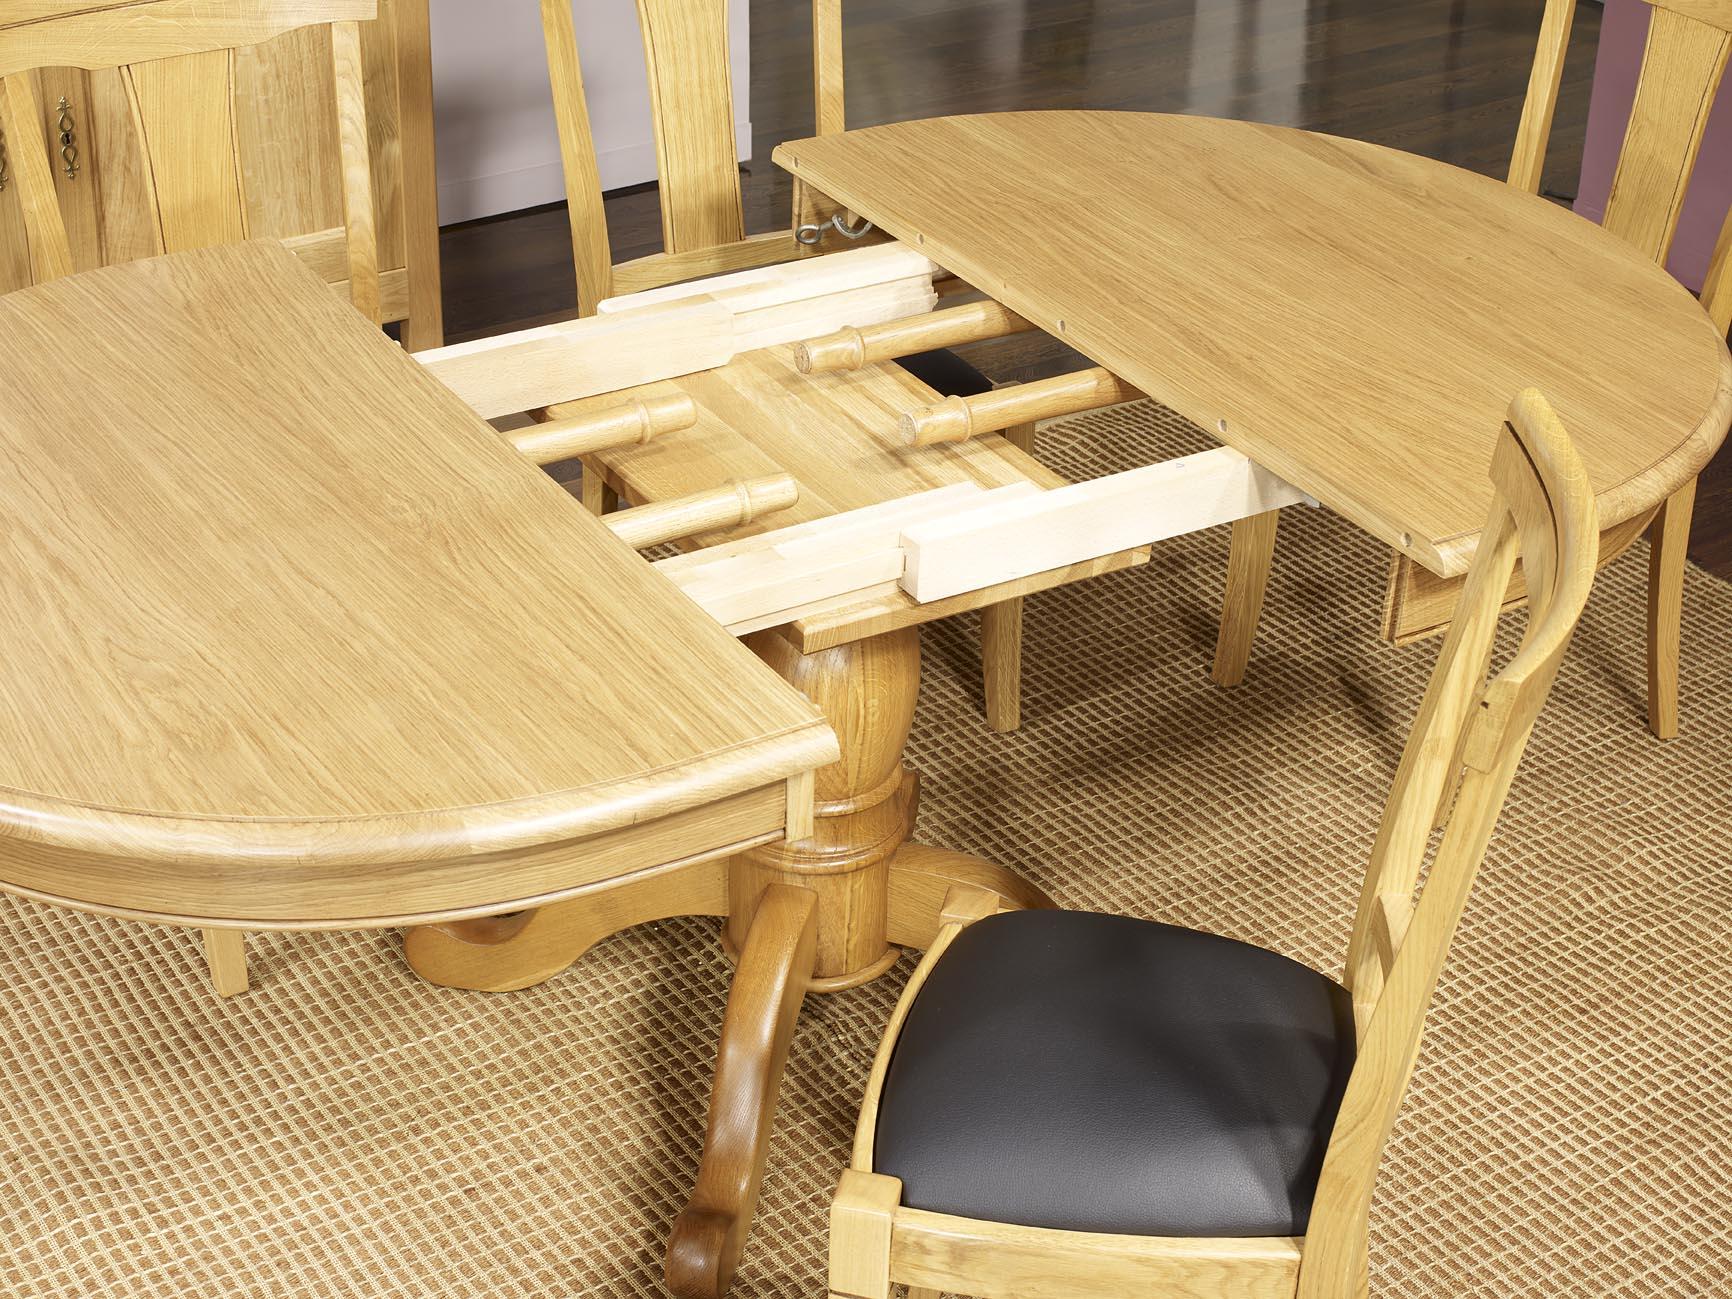 table ovale pied central j r me en ch ne massif de style. Black Bedroom Furniture Sets. Home Design Ideas